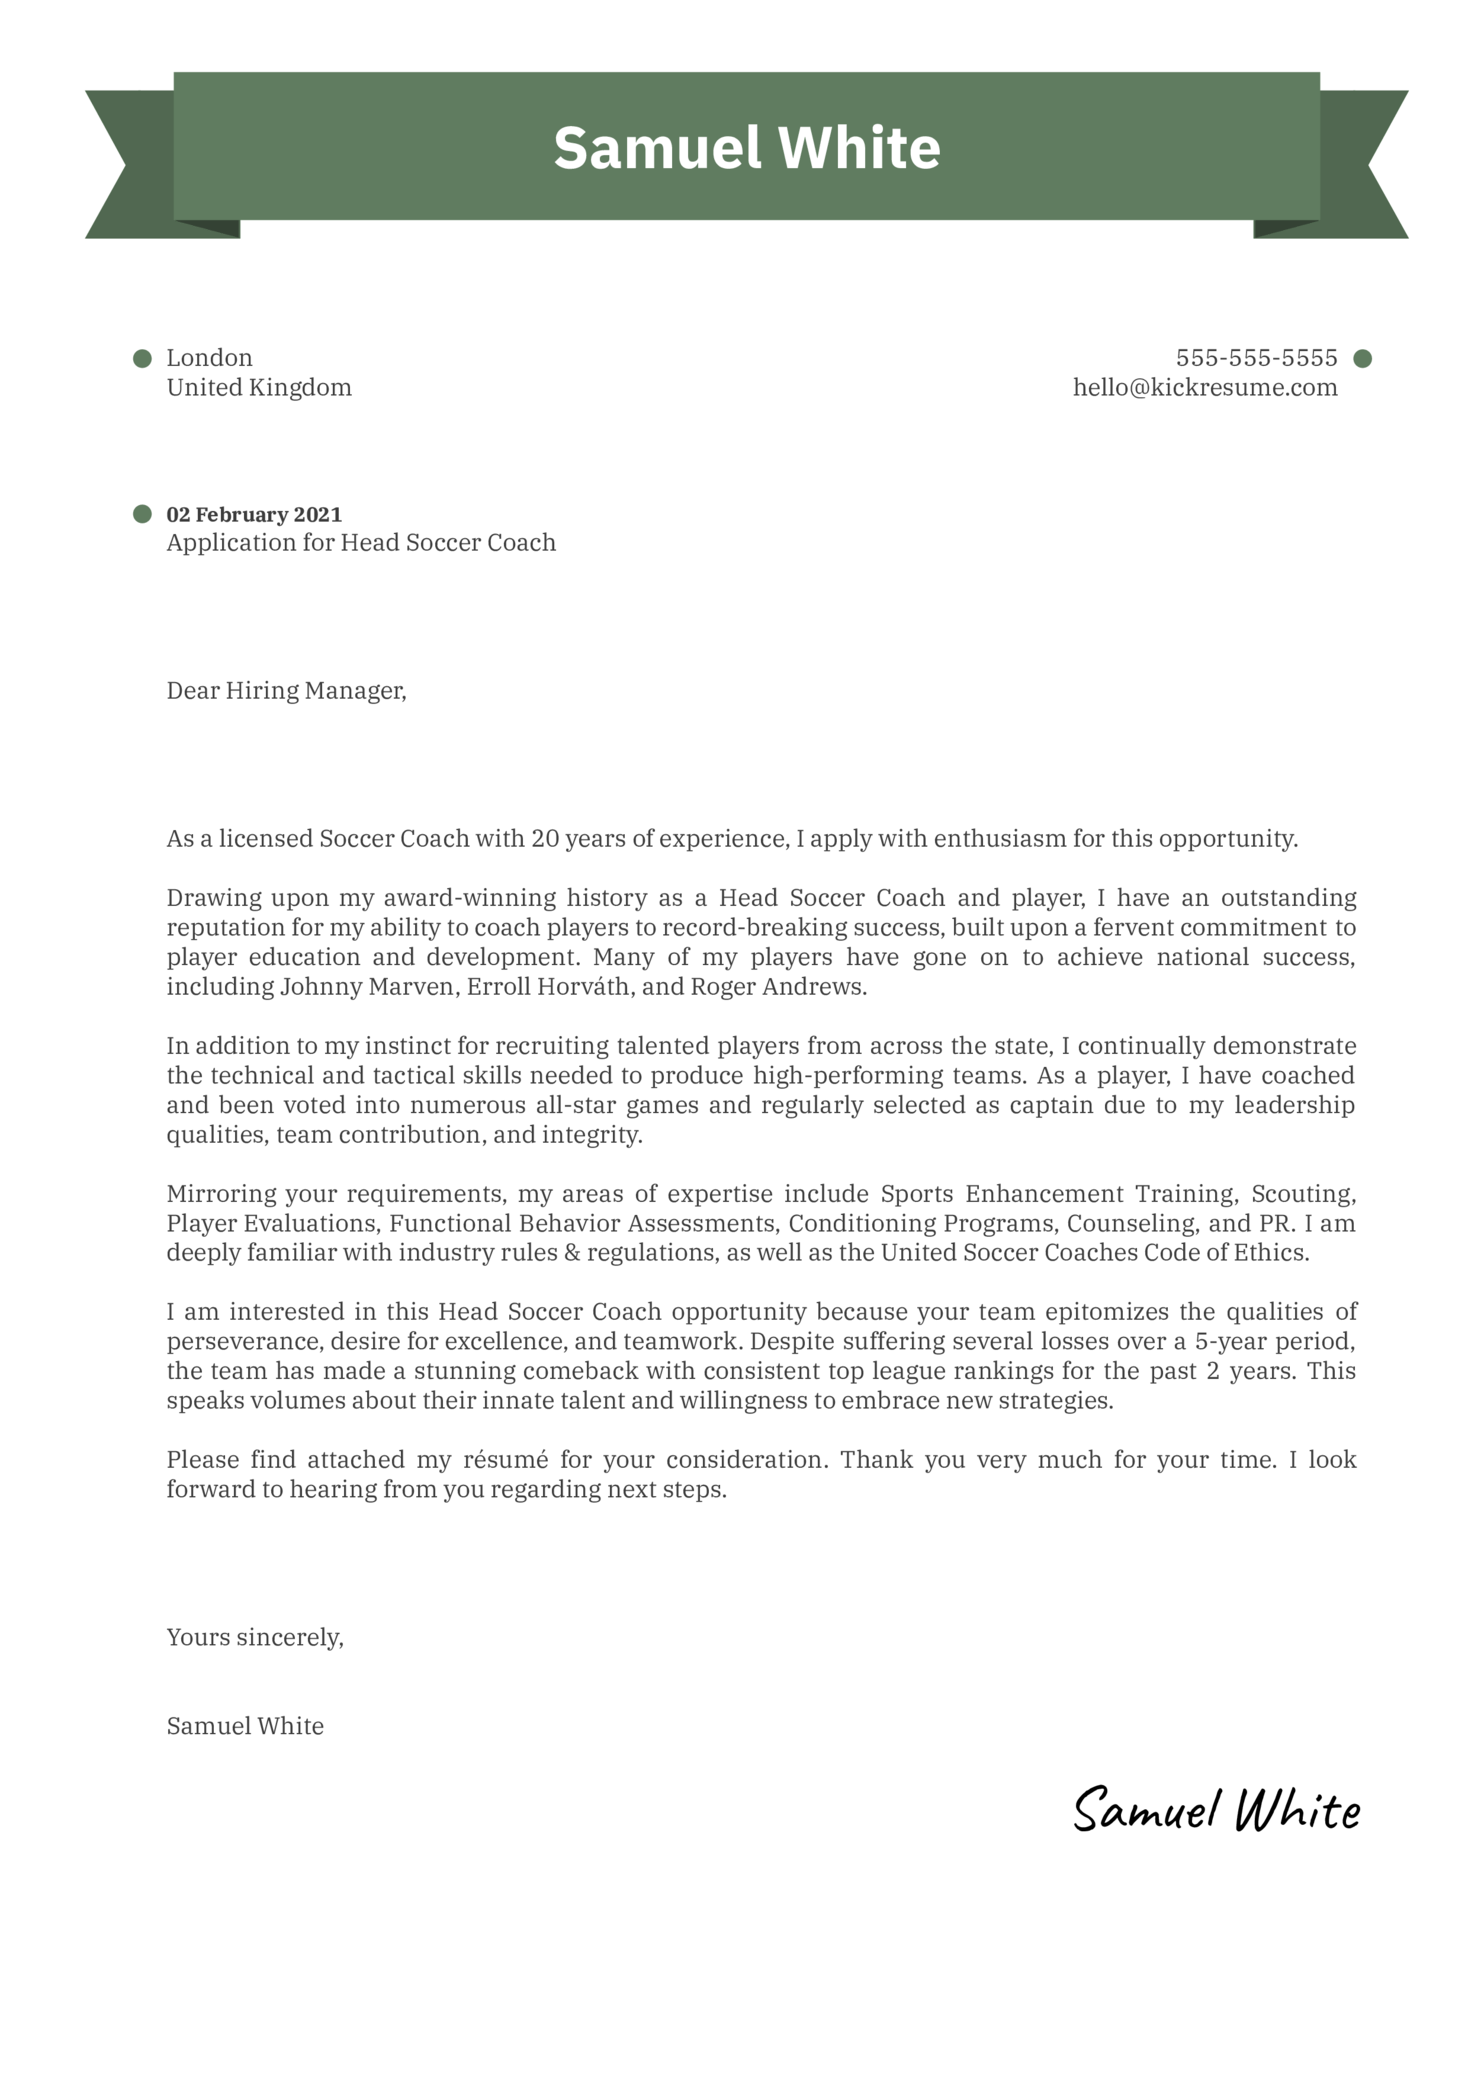 Head Soccer Coach Cover Letter Sample